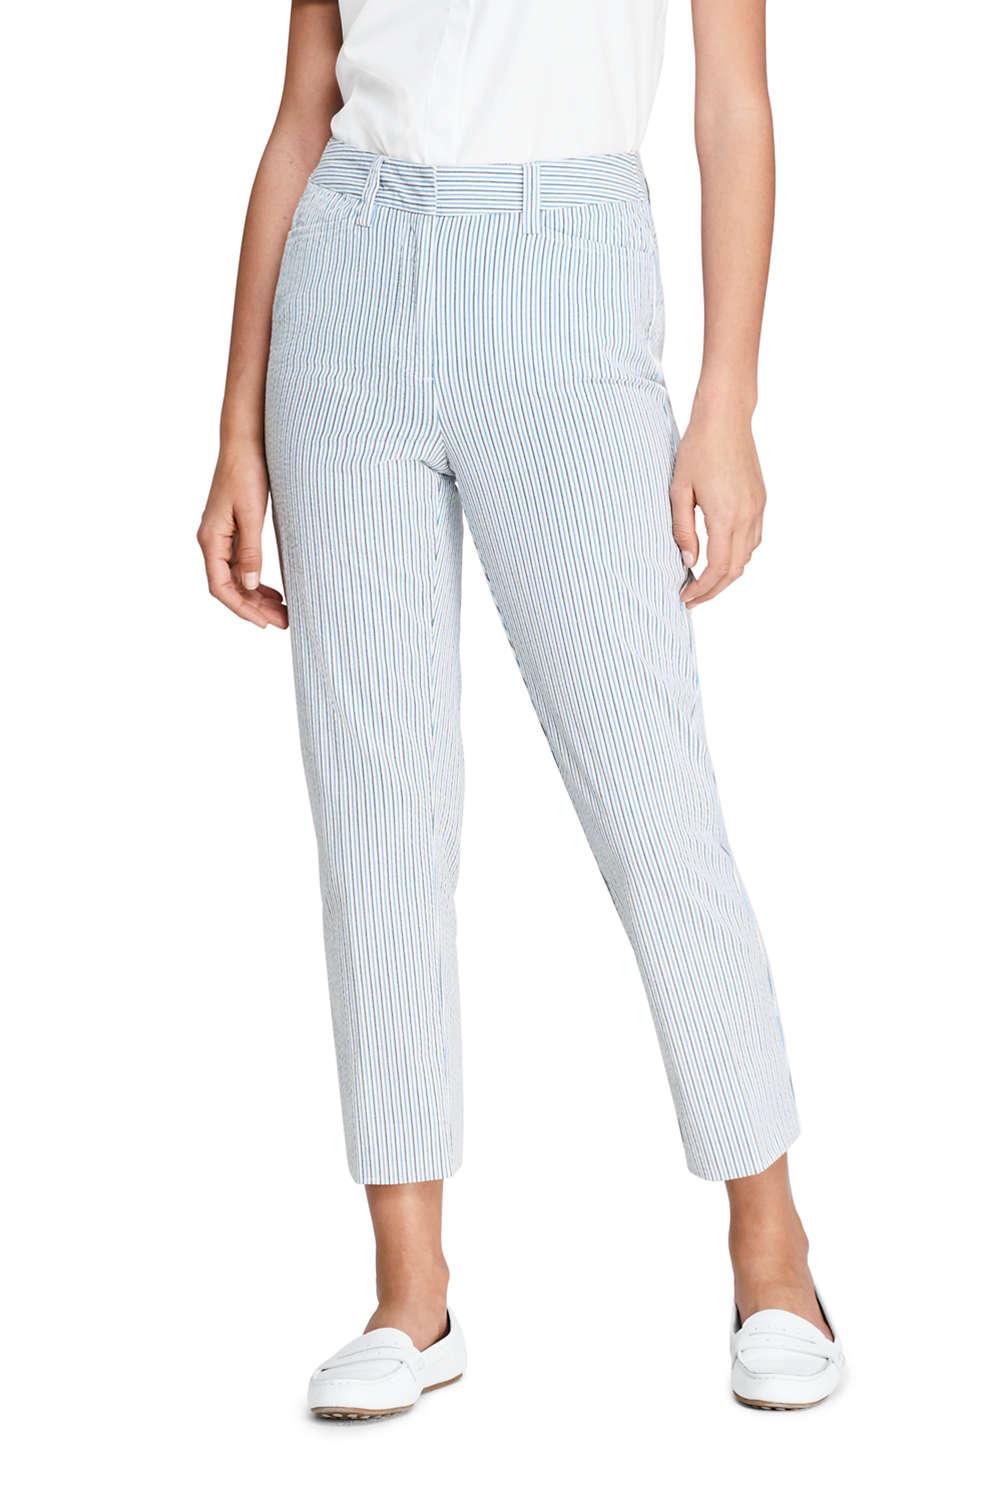 1c56da0335 Women's Mid Rise Seersucker Capri Pants